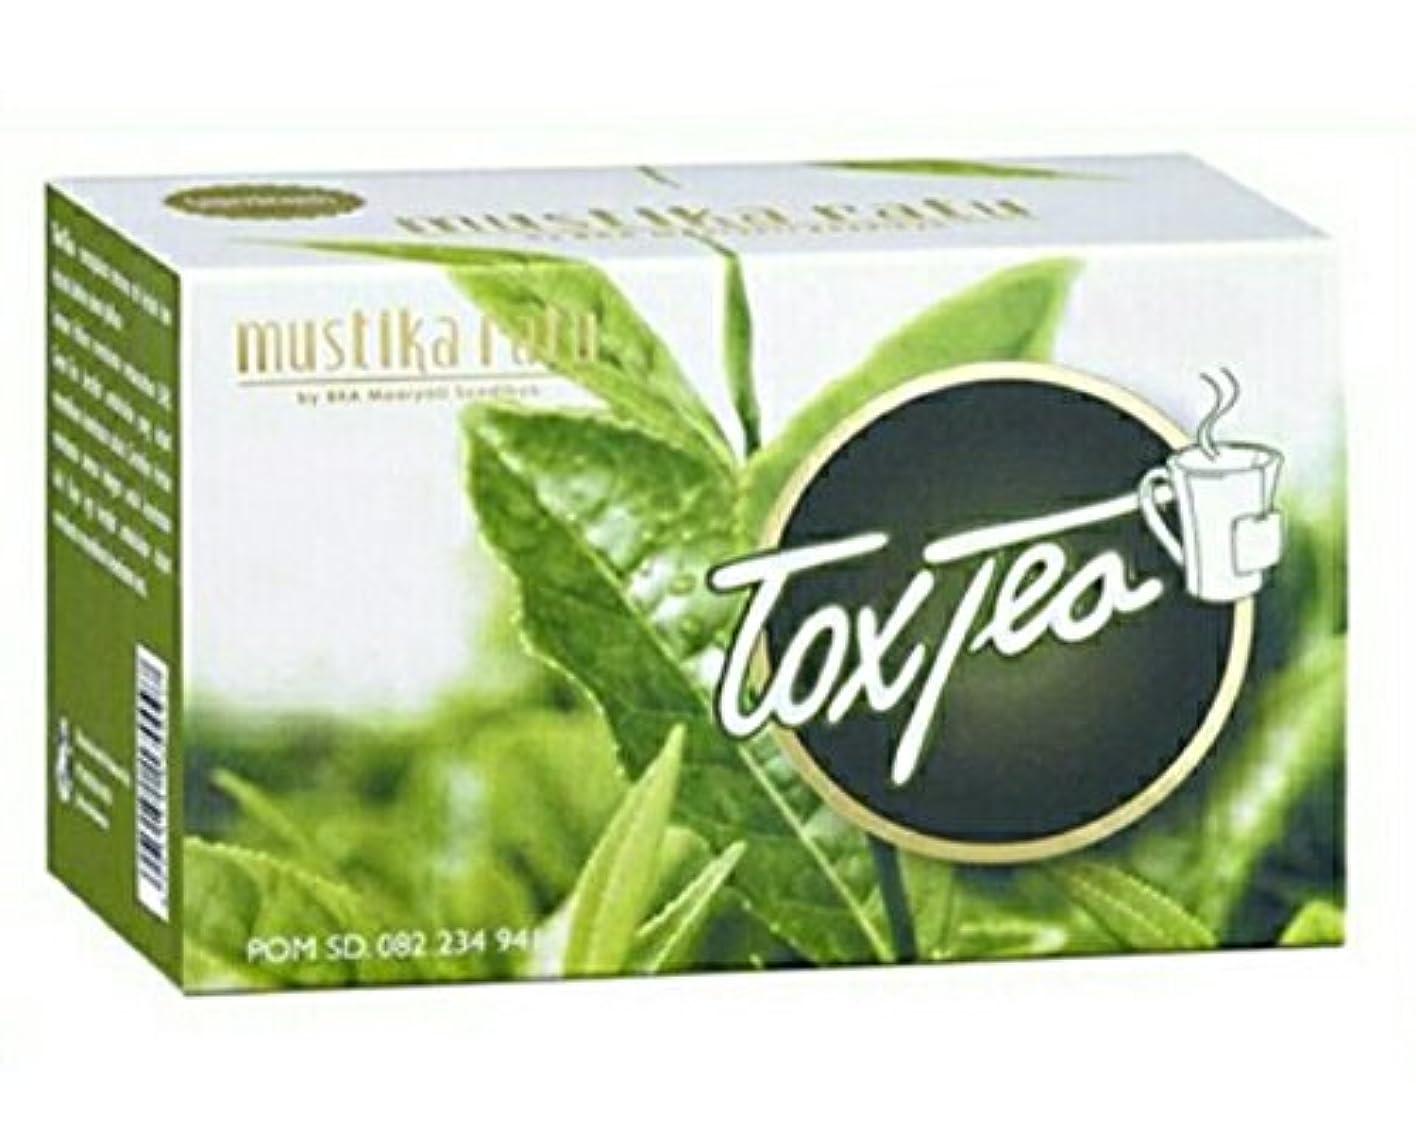 Mustika ratu Tea ムスティカラトゥトックスティー3箱x 15個のティーバッグ= 45個のティーバッグ